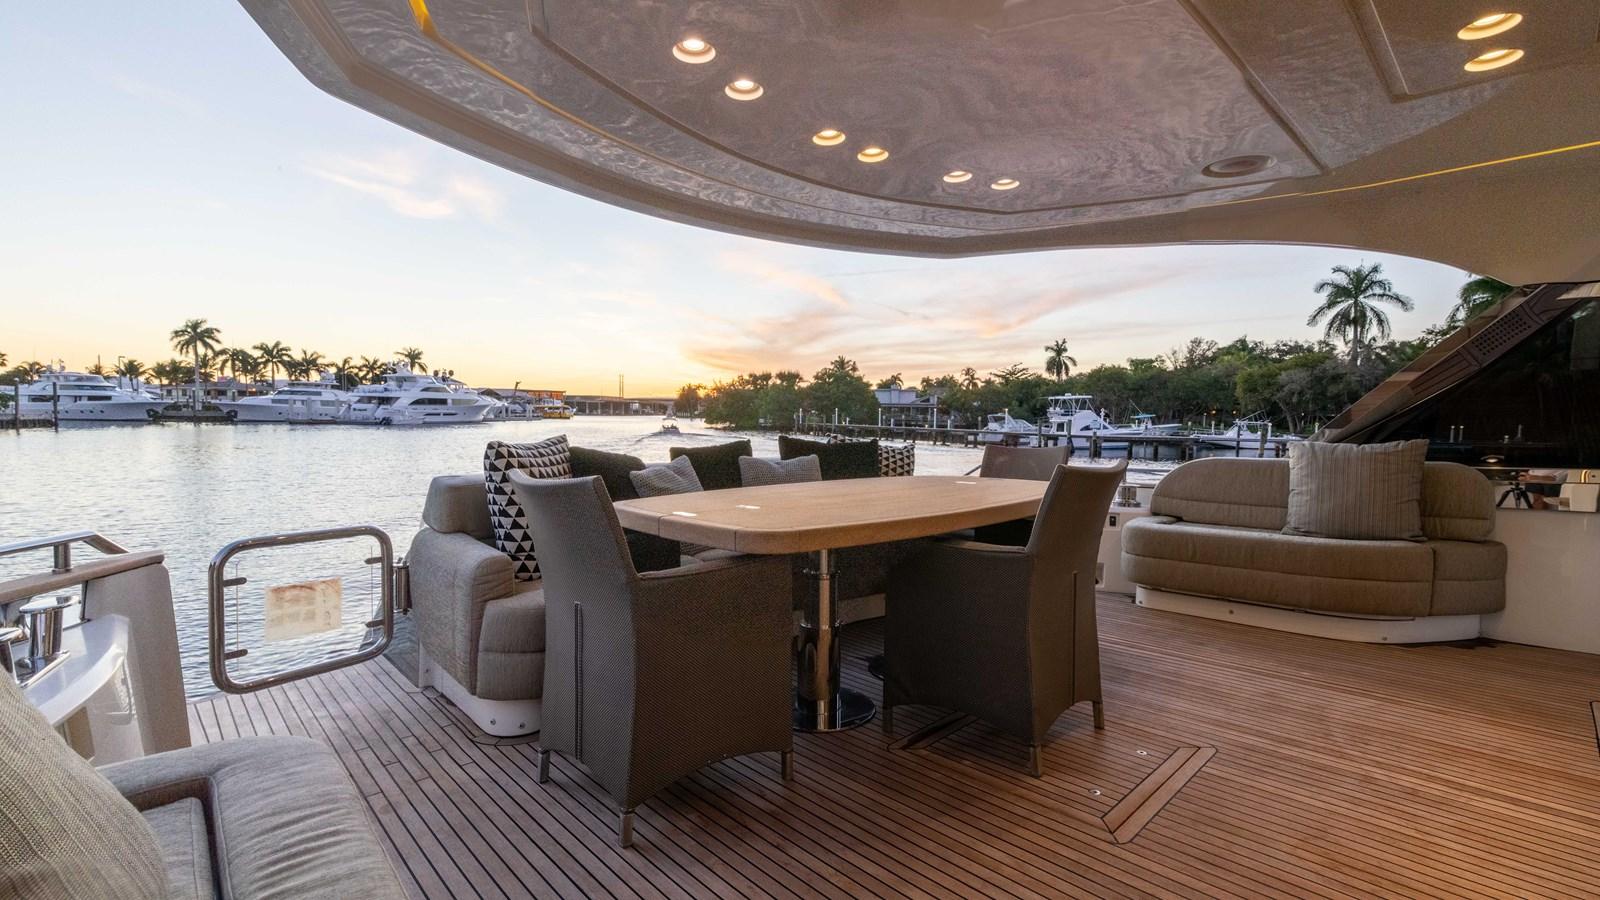 76 Monte Carlo (105 of 127) 2014 MONTE CARLO YACHTS Motoryacht Motor Yacht 2825065